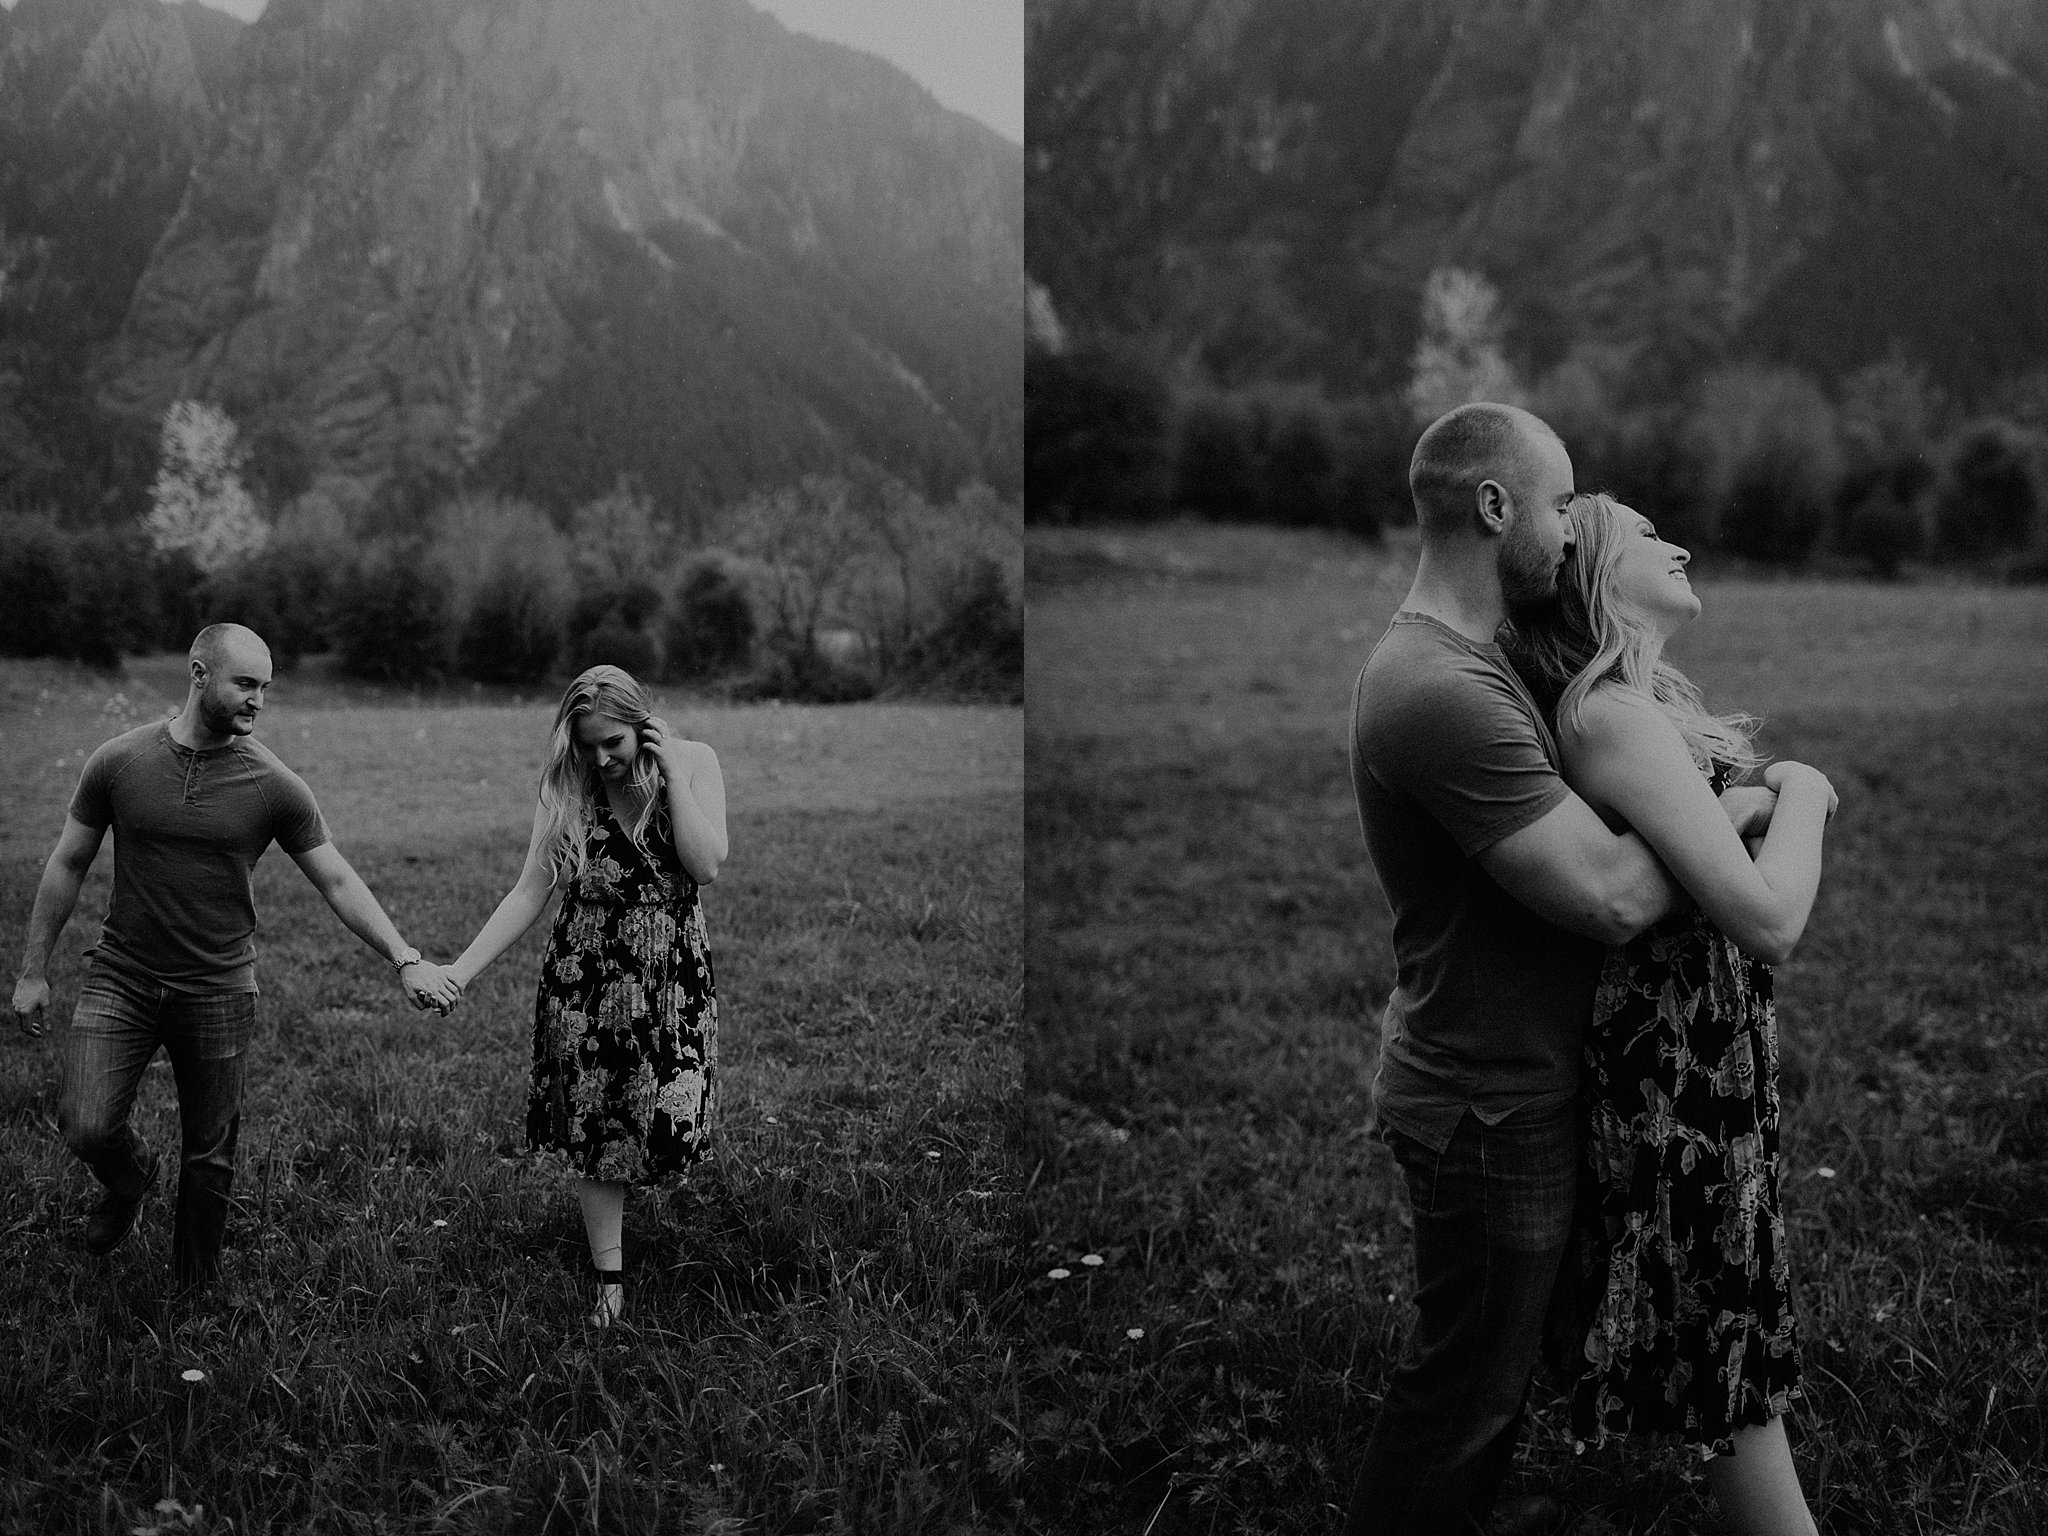 samantha_mcfarlen_bellingham_washington_engagement_photography_seattle_wedding_photographer_0300.jpg